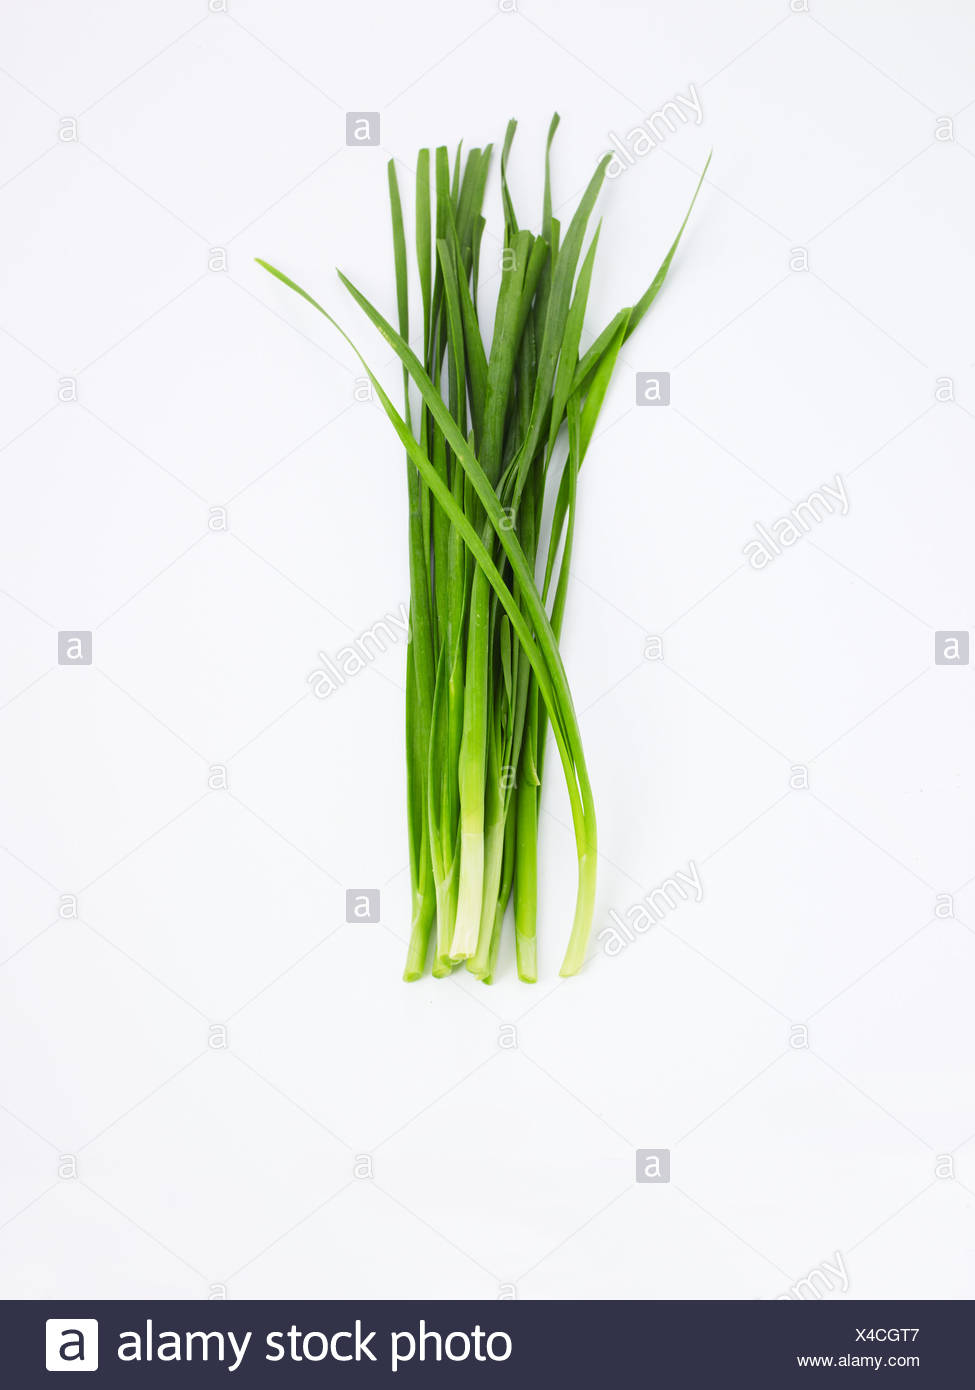 Garlic Chives on white background - Stock Image